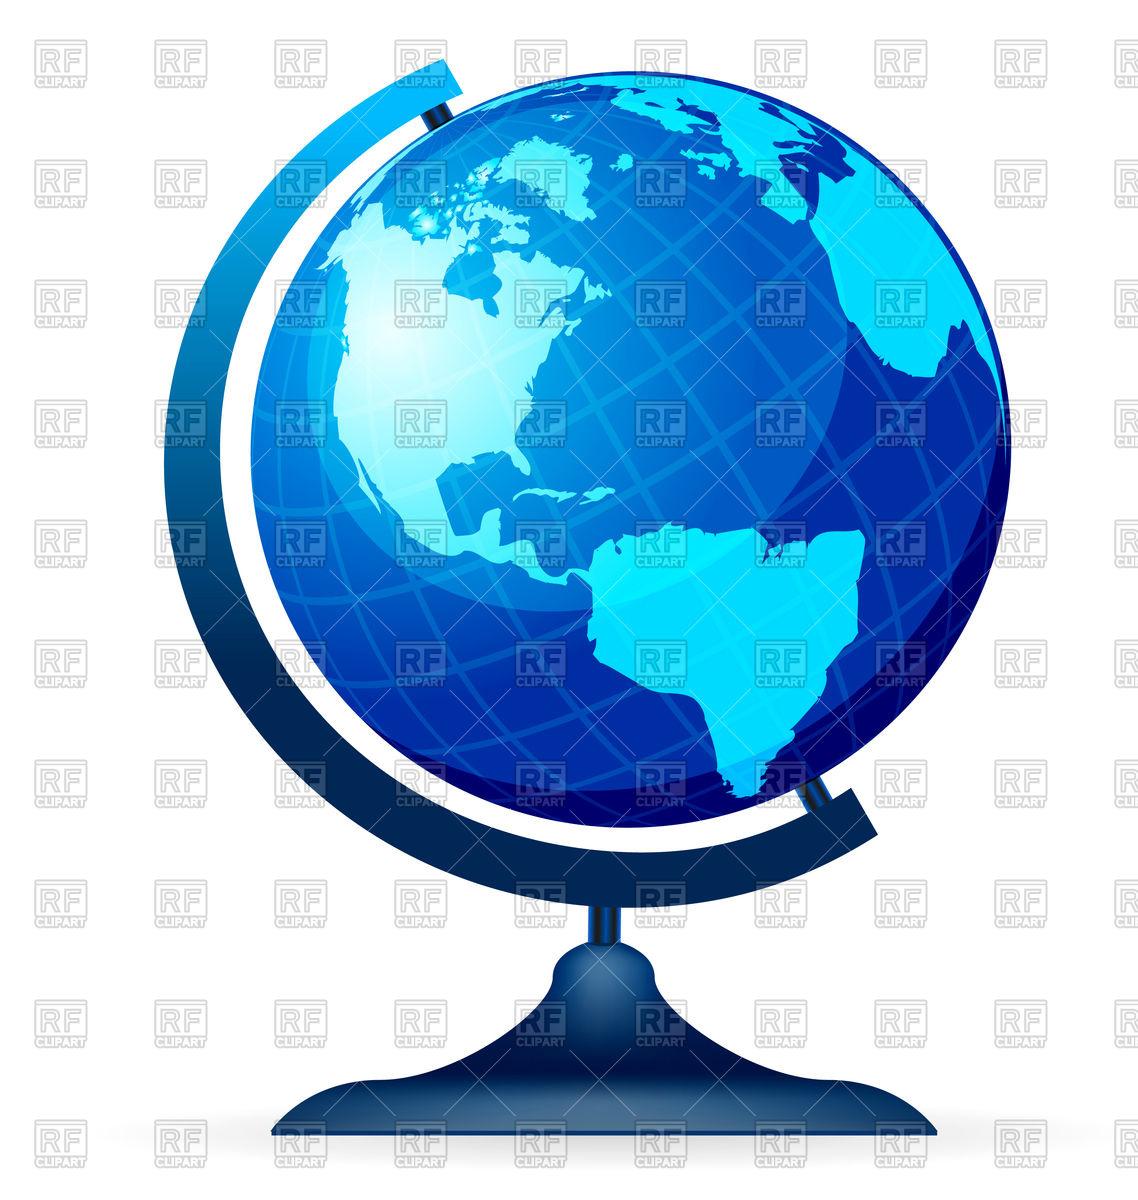 Terrestrial globe Vector Image #73994.